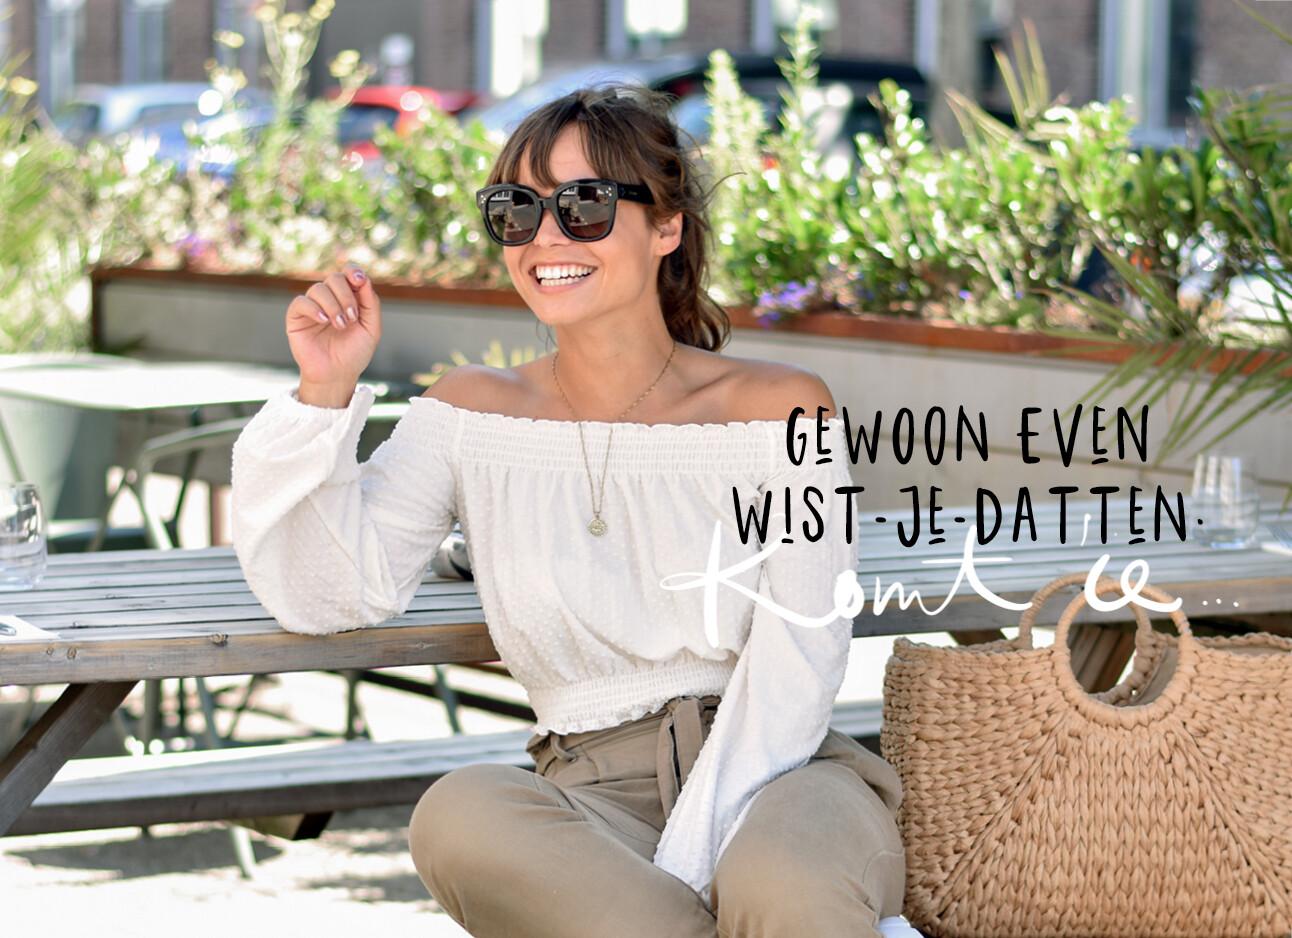 Kiki lachend zittend op een bankje met zonnebril